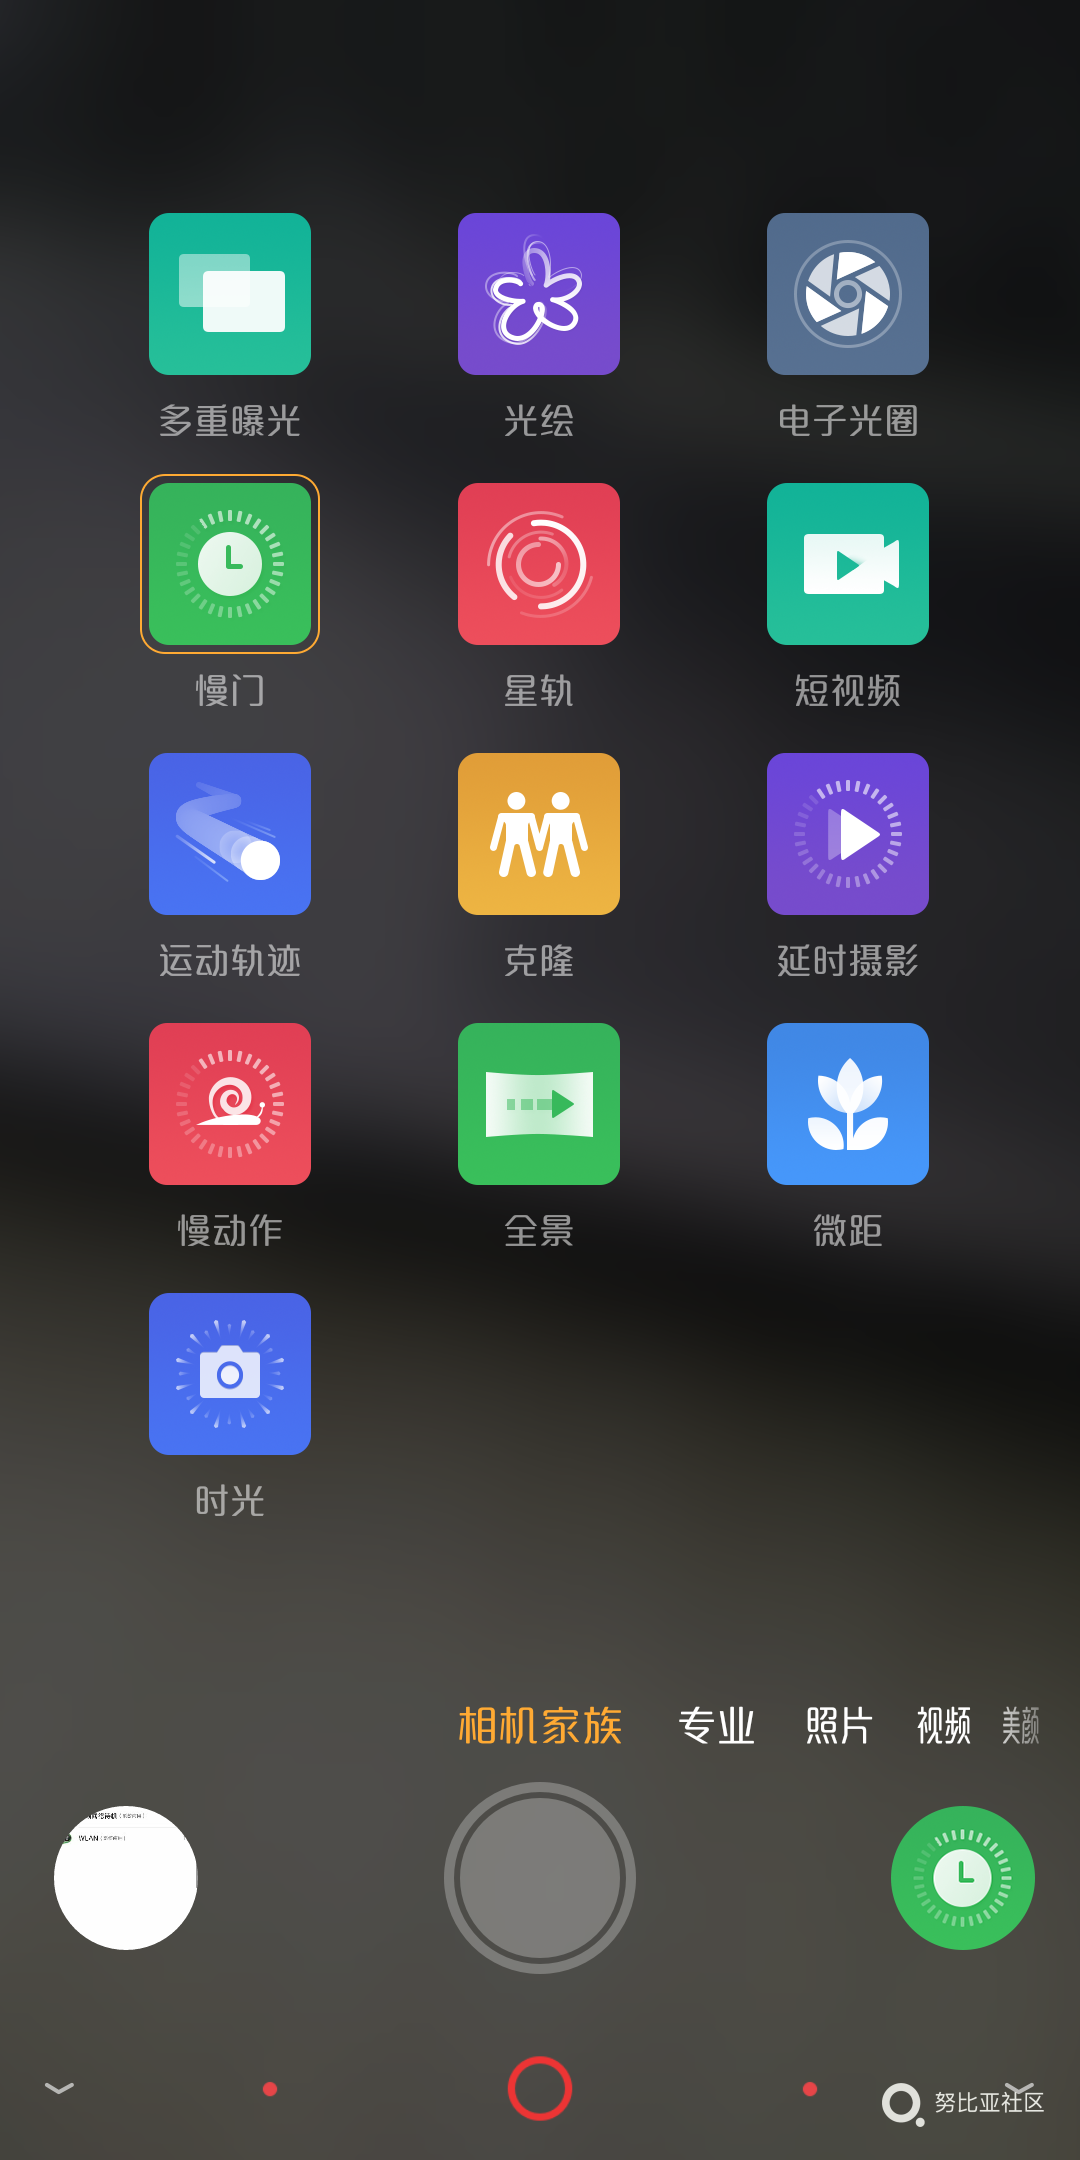 Screenshot_2018-05-03-12-20-19.png